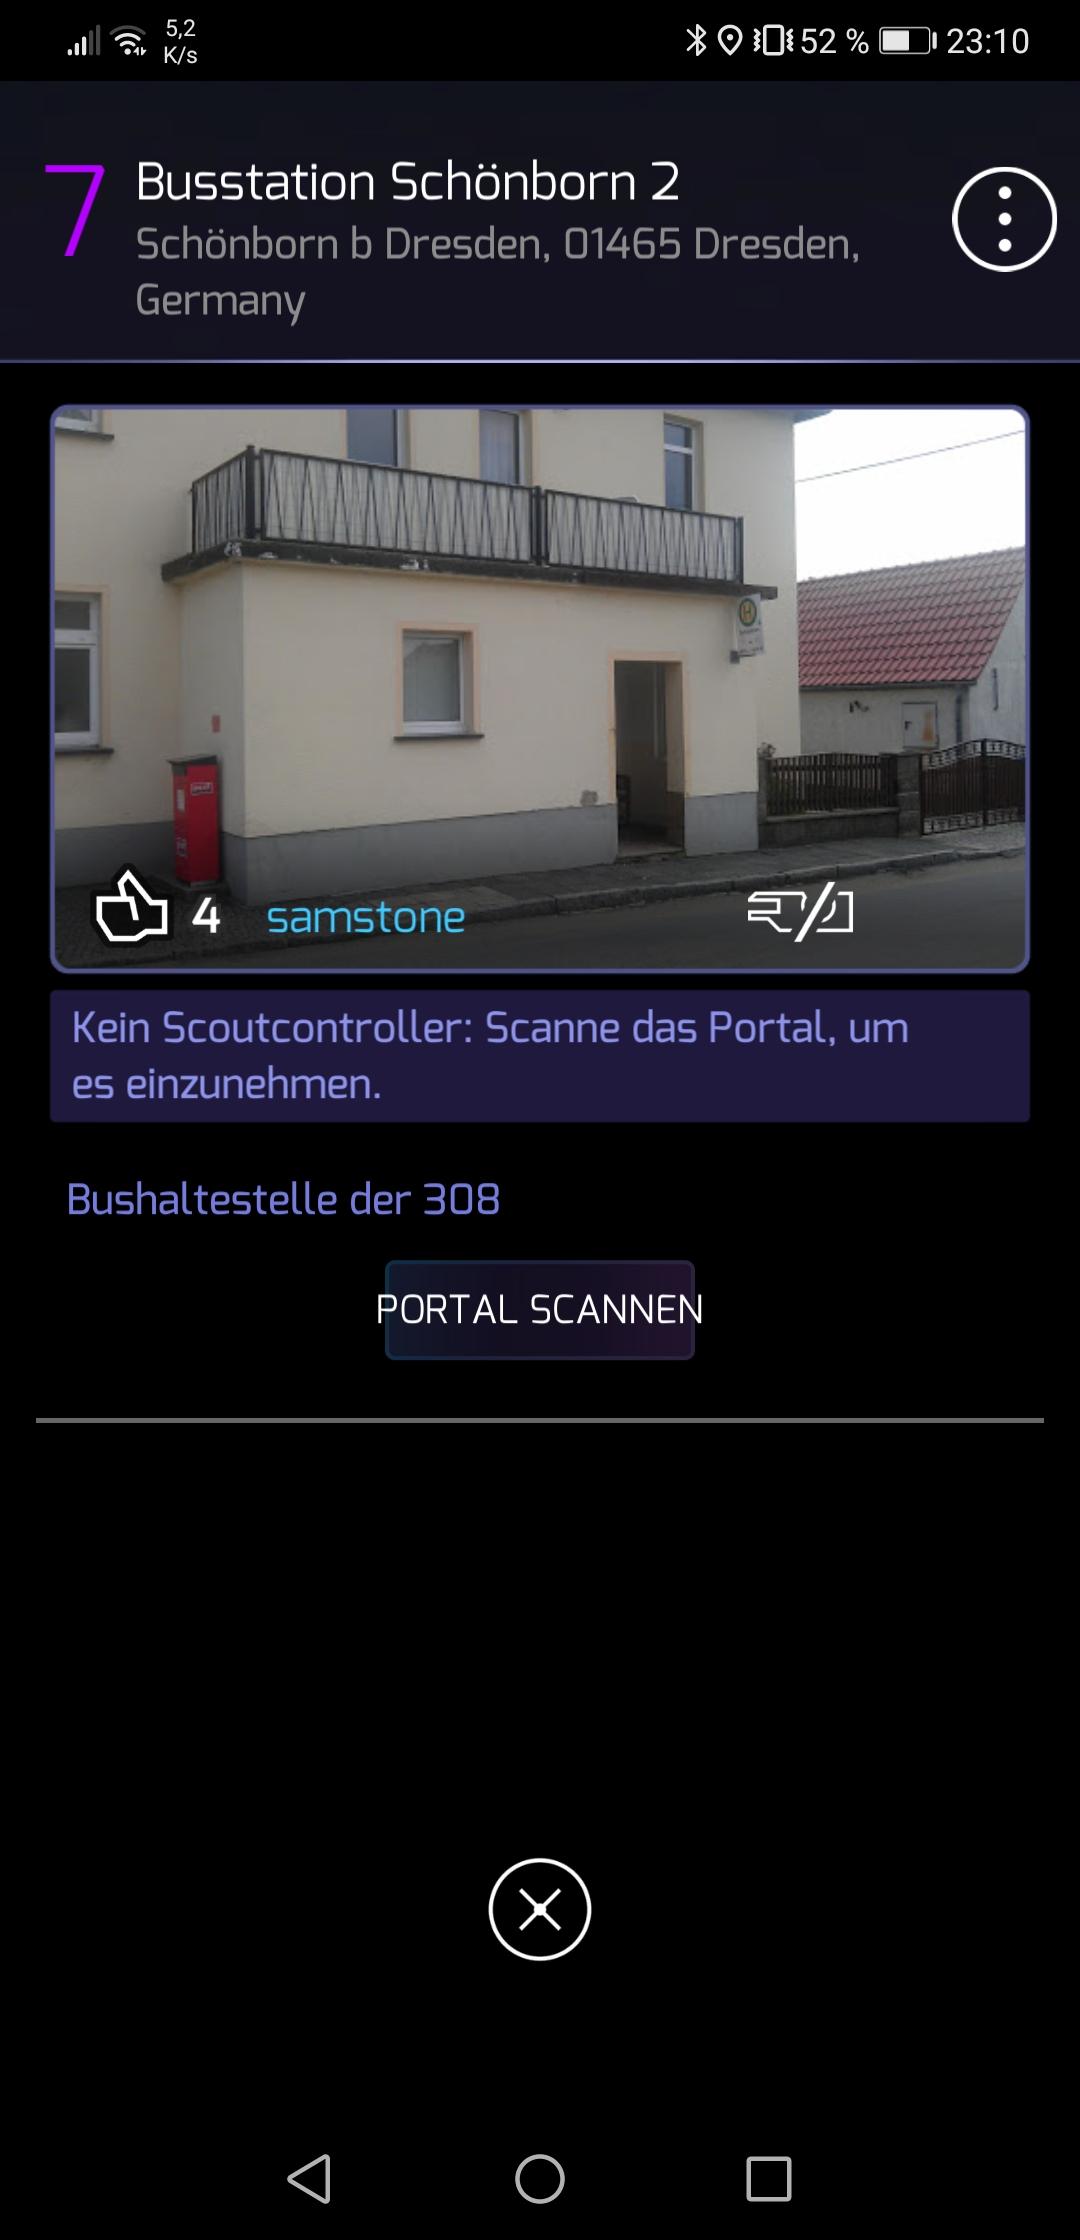 Screenshot_20210621_231054_com.nianticproject.ingress.jpg